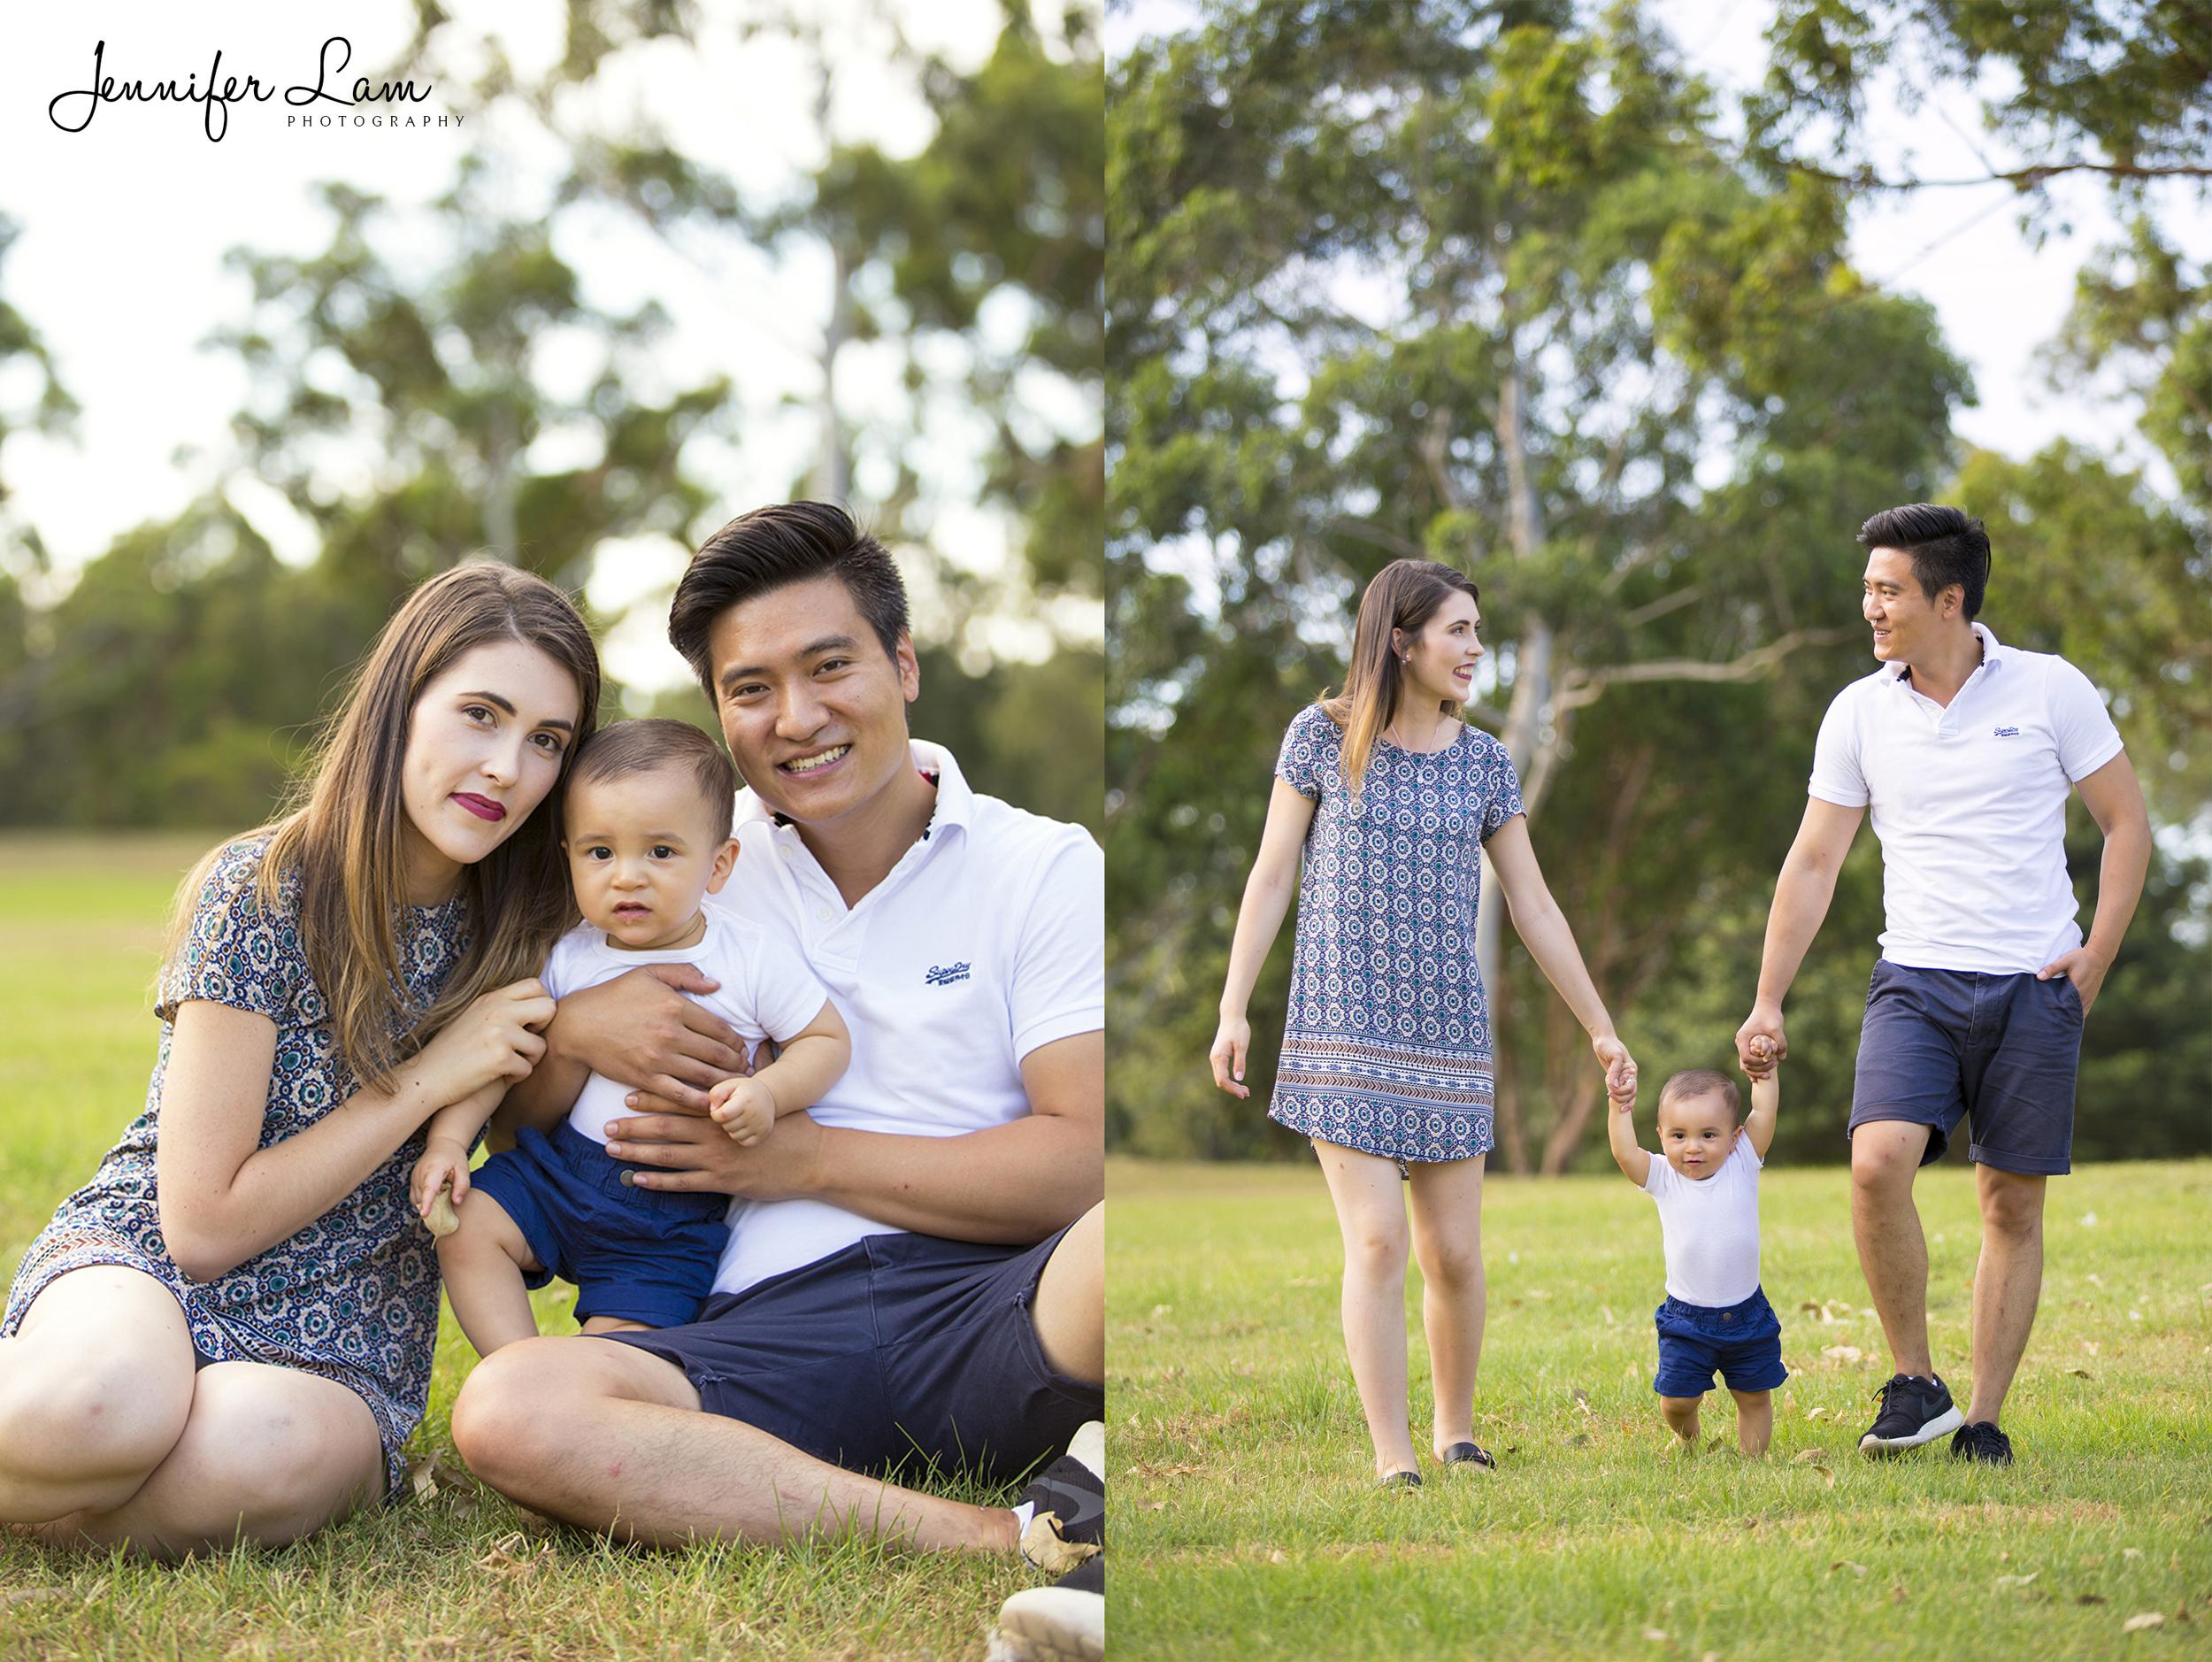 First Birthday - Sydney Family Portrait Photography - Jennifer Lam Photography (3).jpg